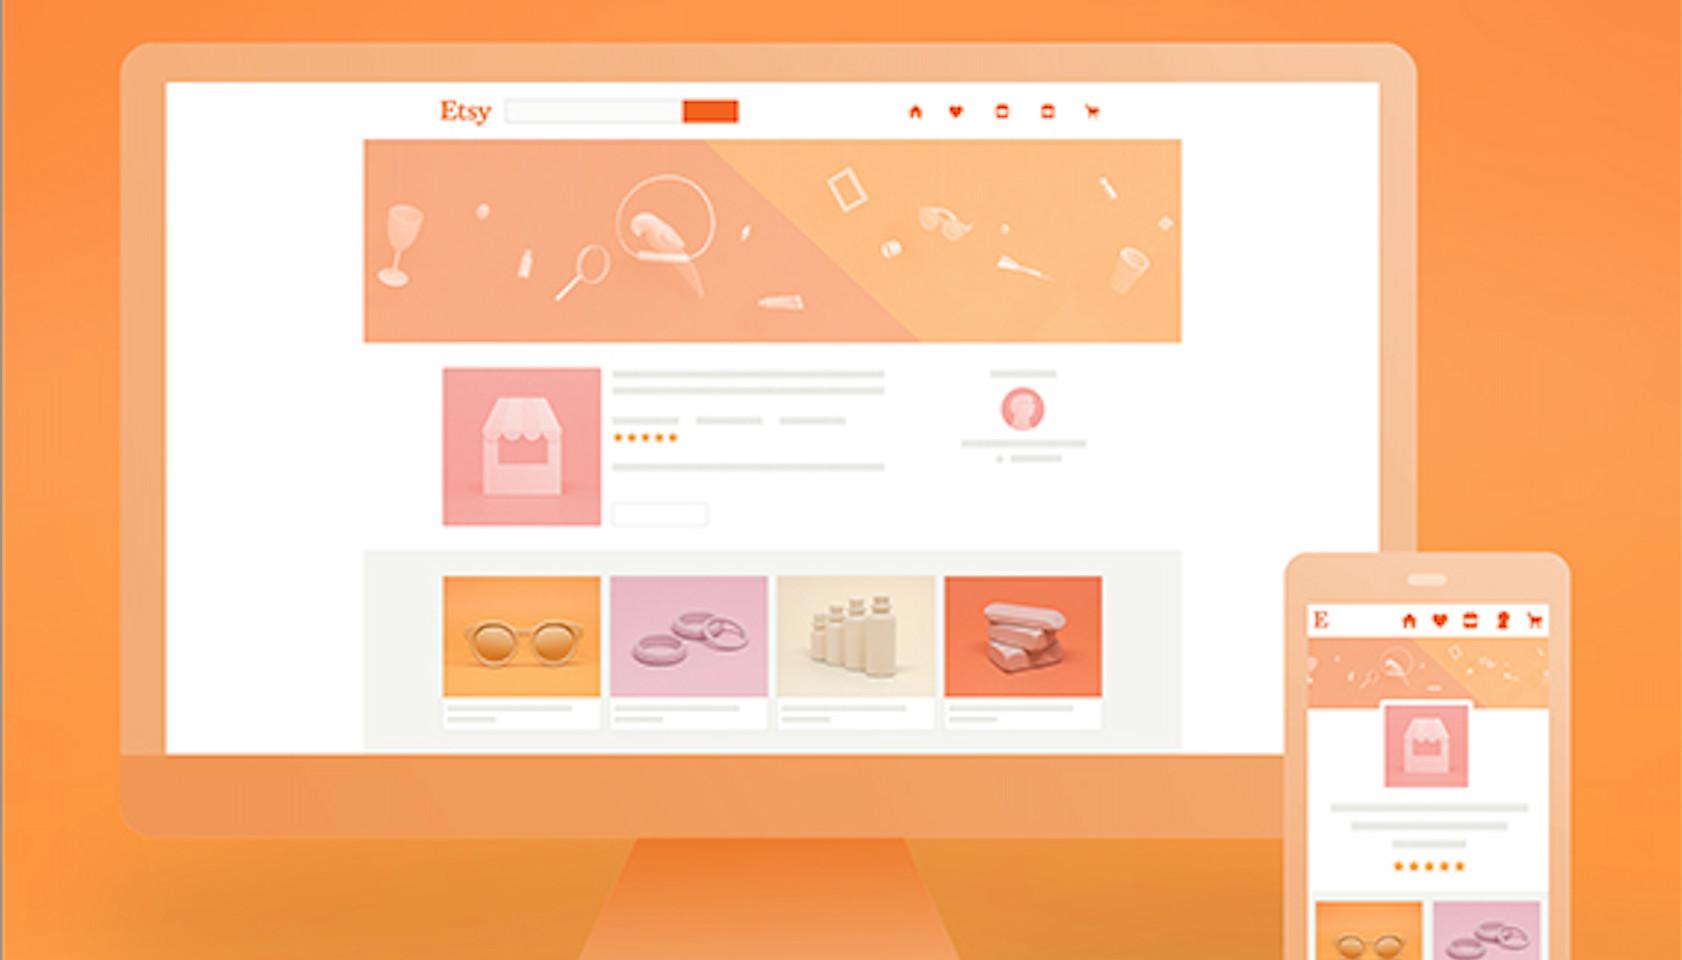 Diy Websitebuilder  Etsy launches Pattern a DIY websites builder Internet